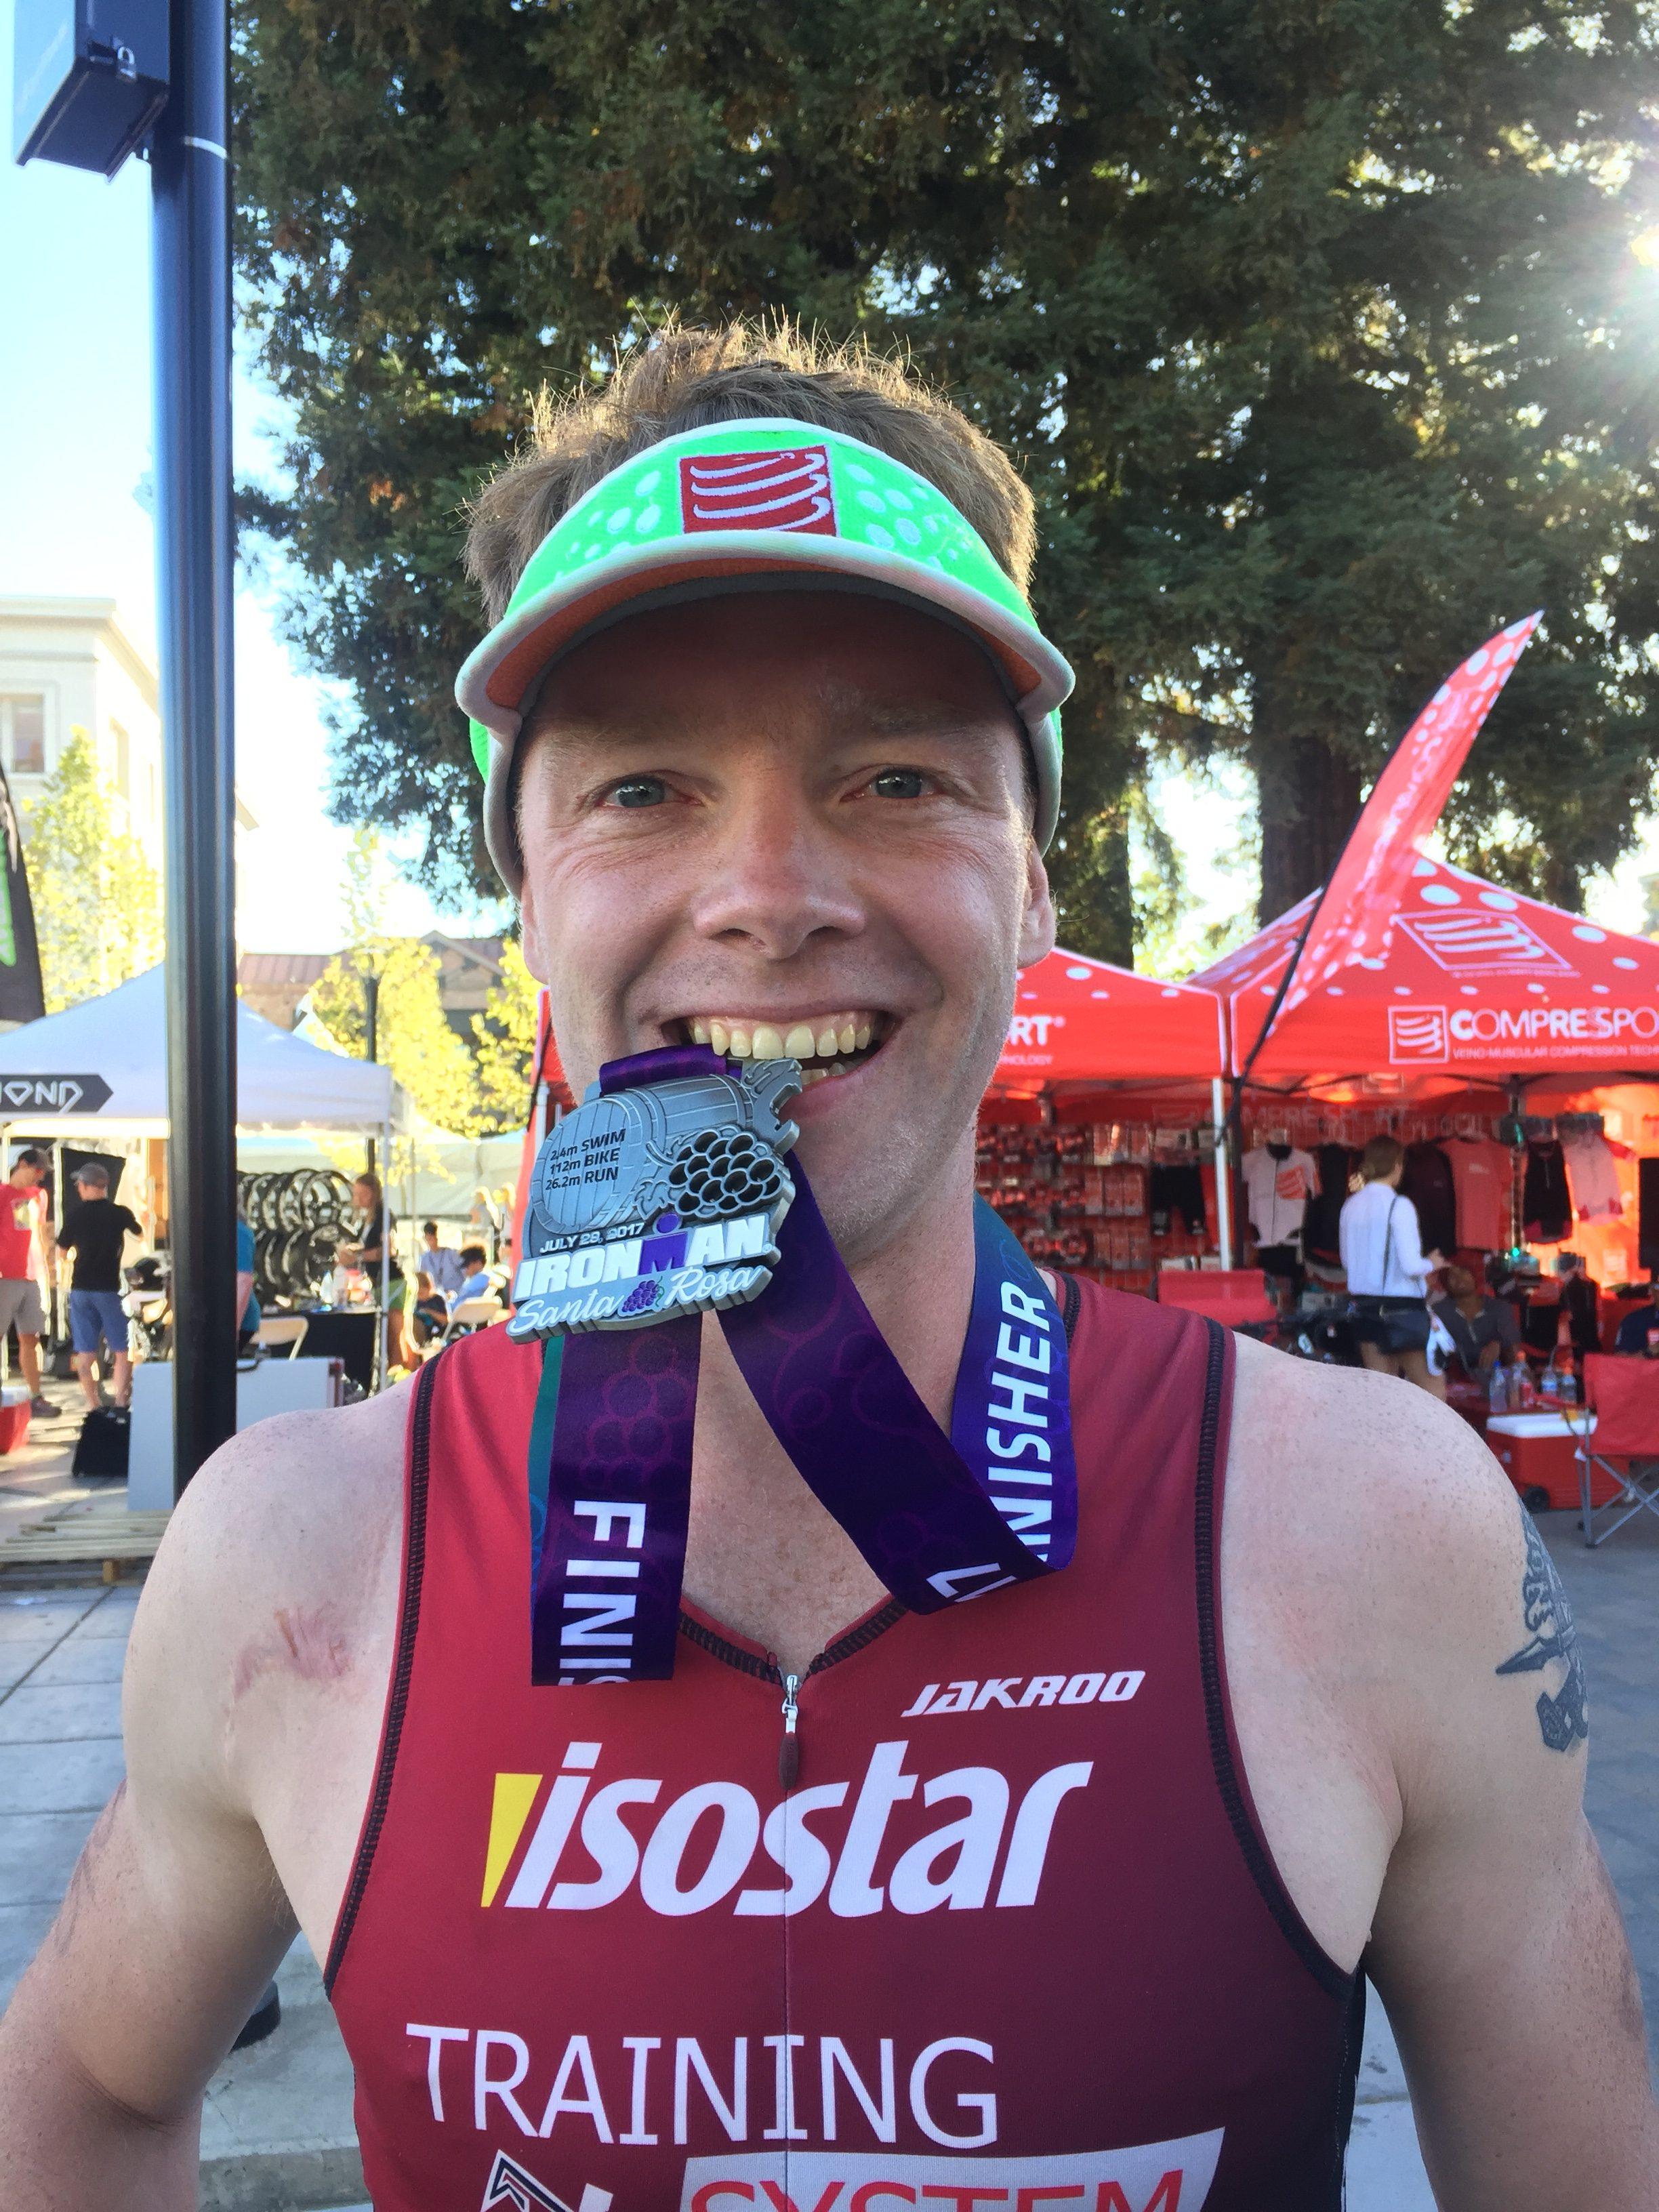 Фото финишера Ironman Santa Rosa